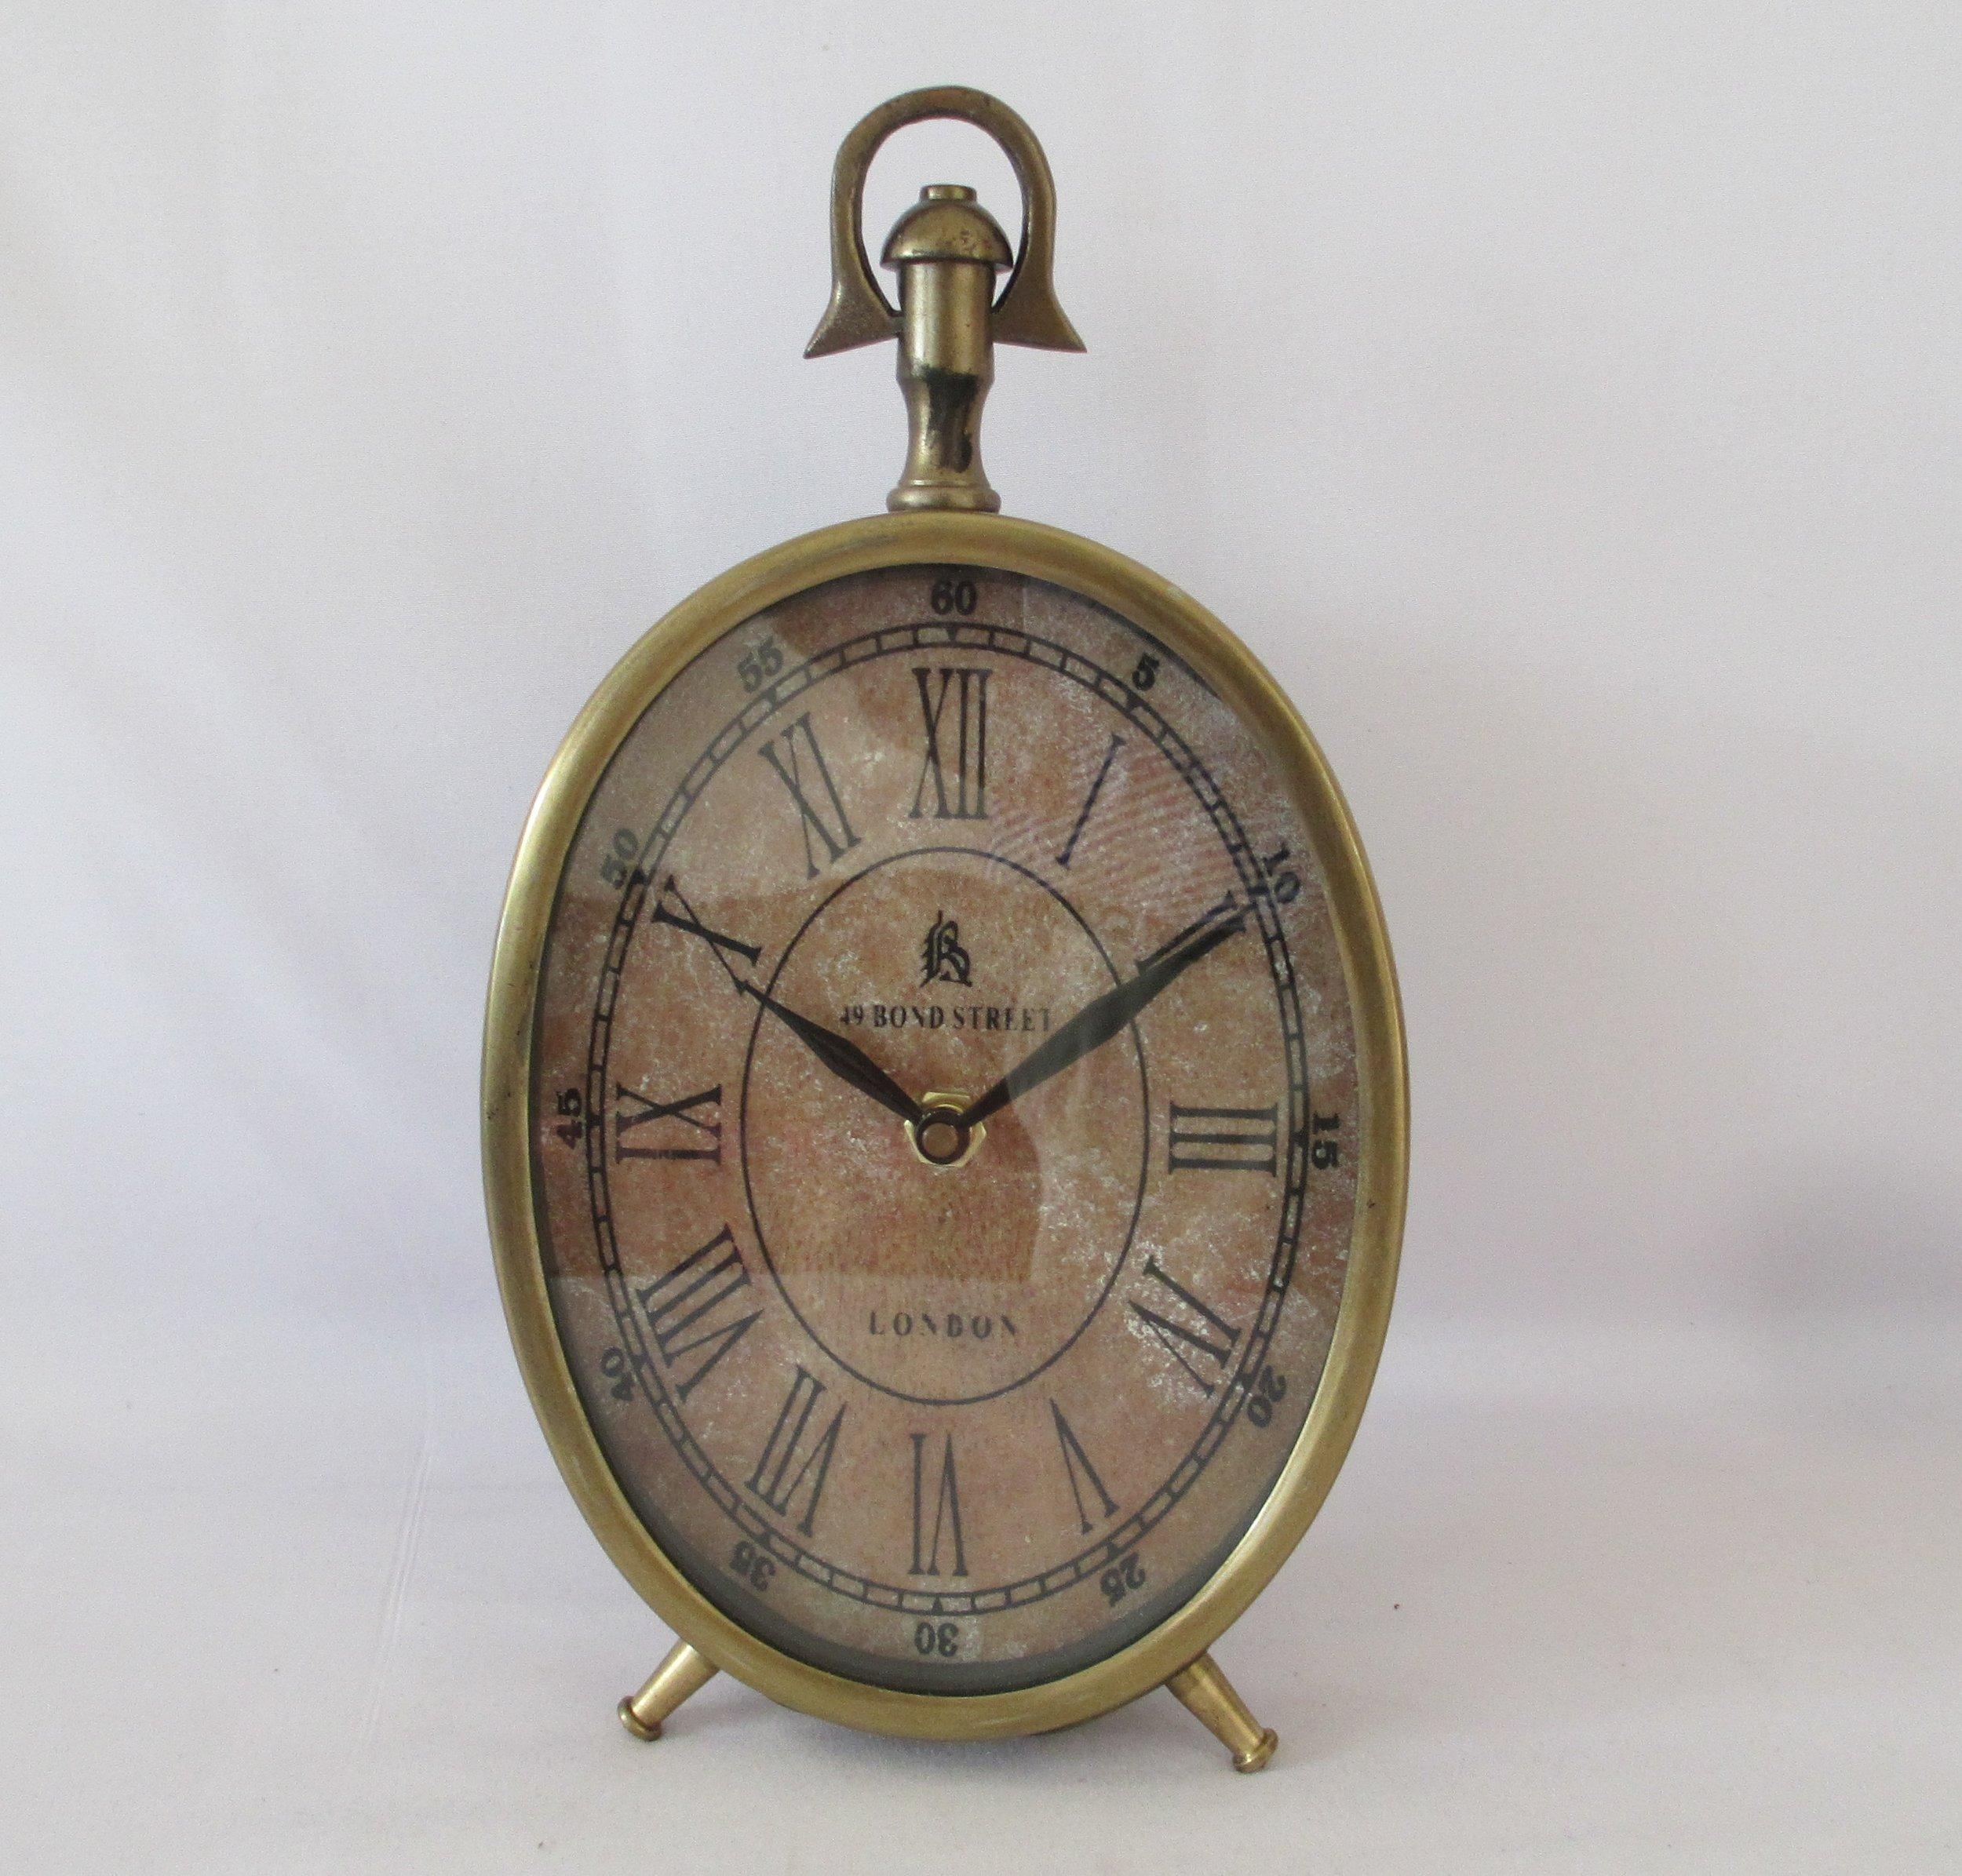 Vintage Clocks retro style00011.jpg